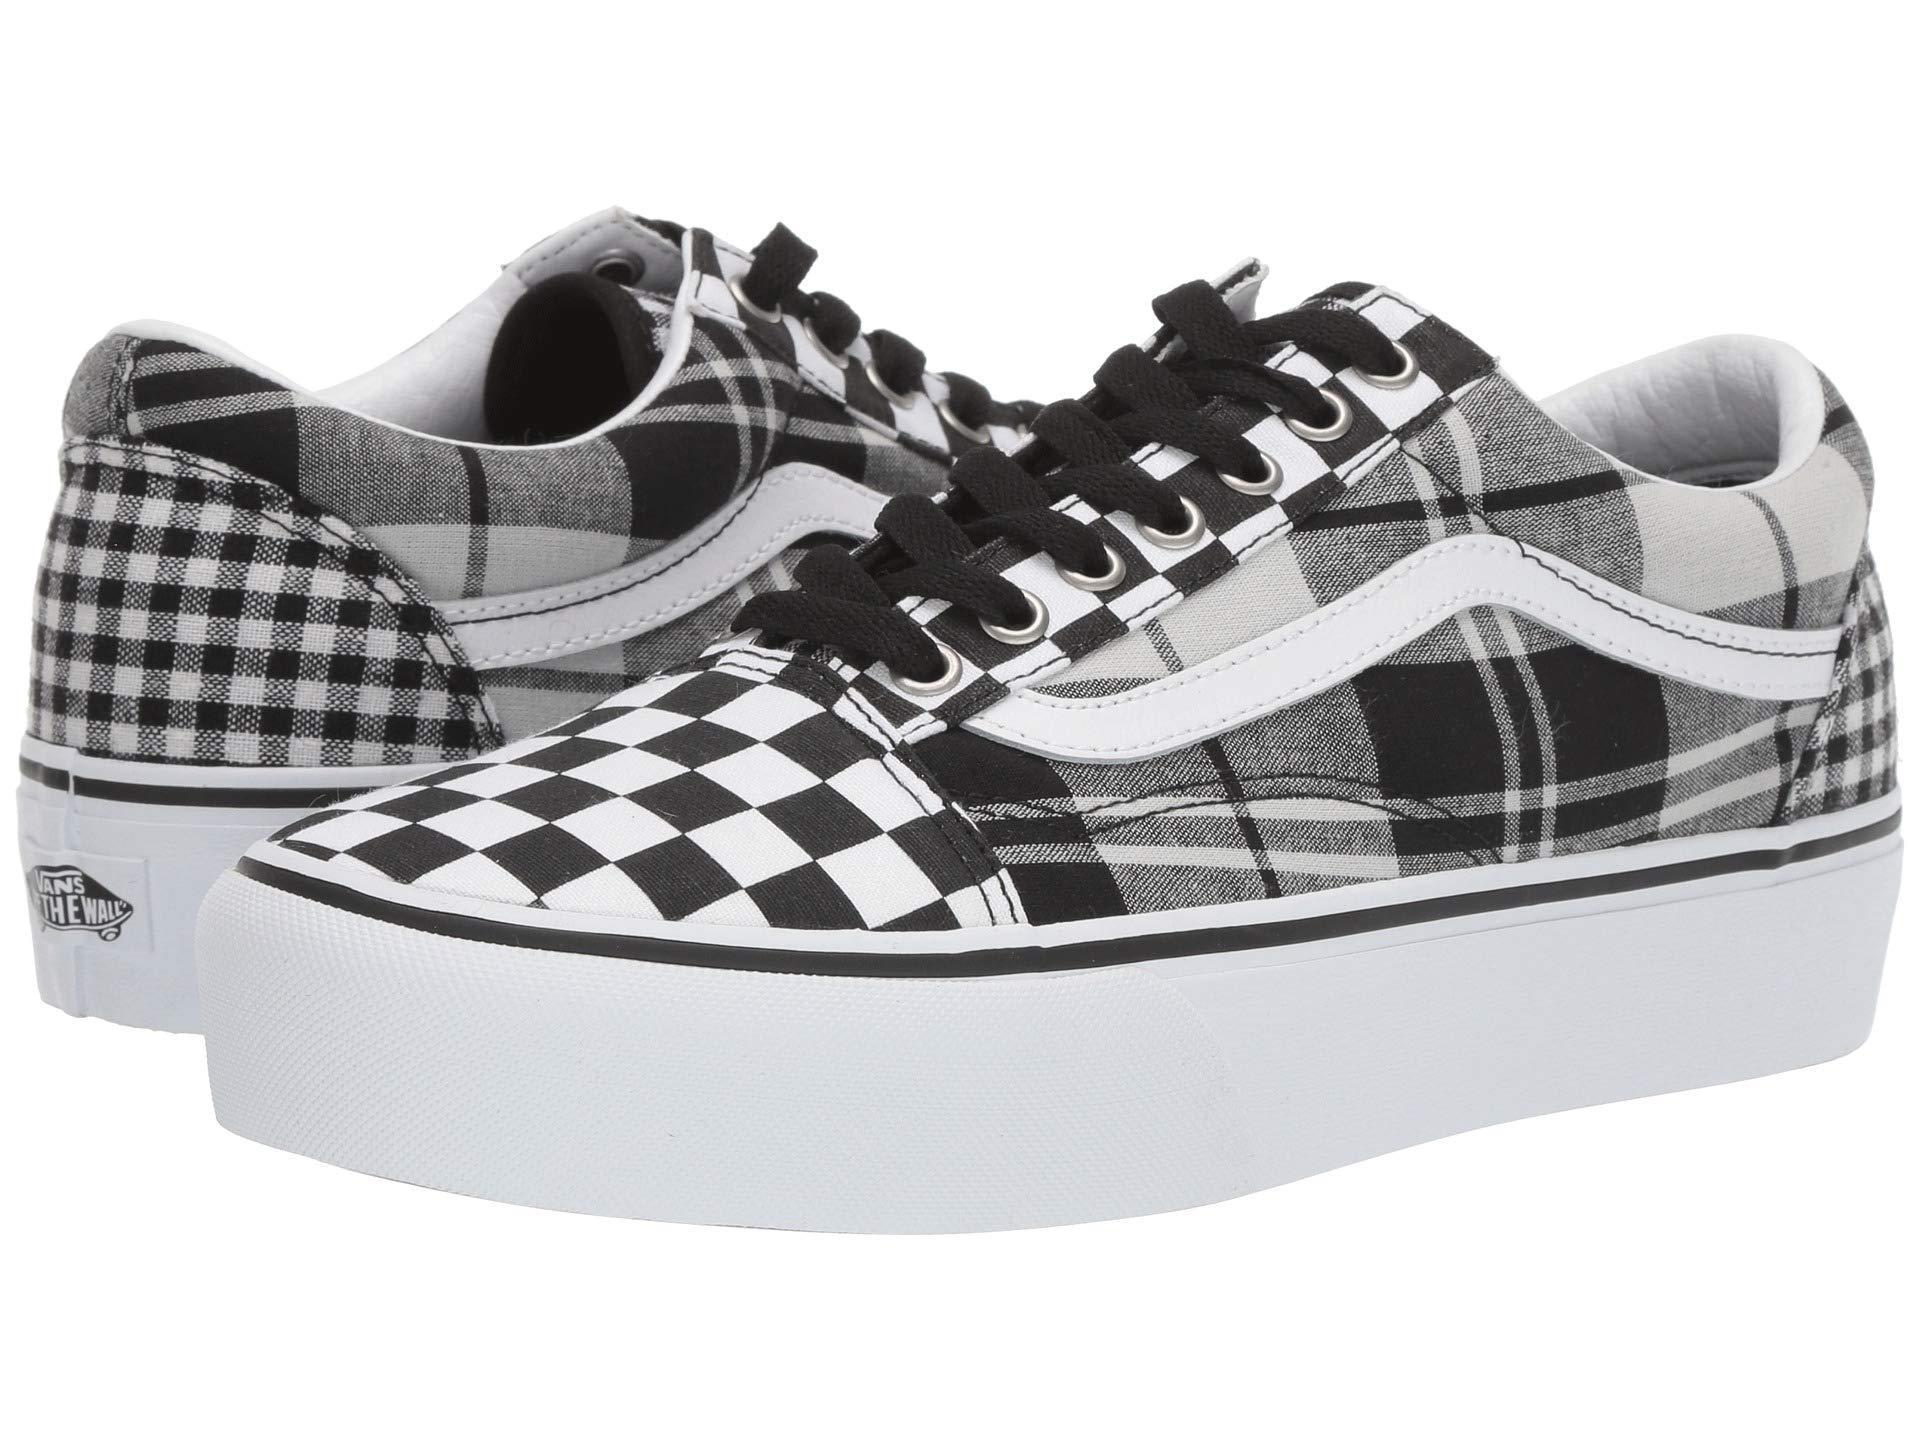 Vans Canvas Plaid Checkerboard Old